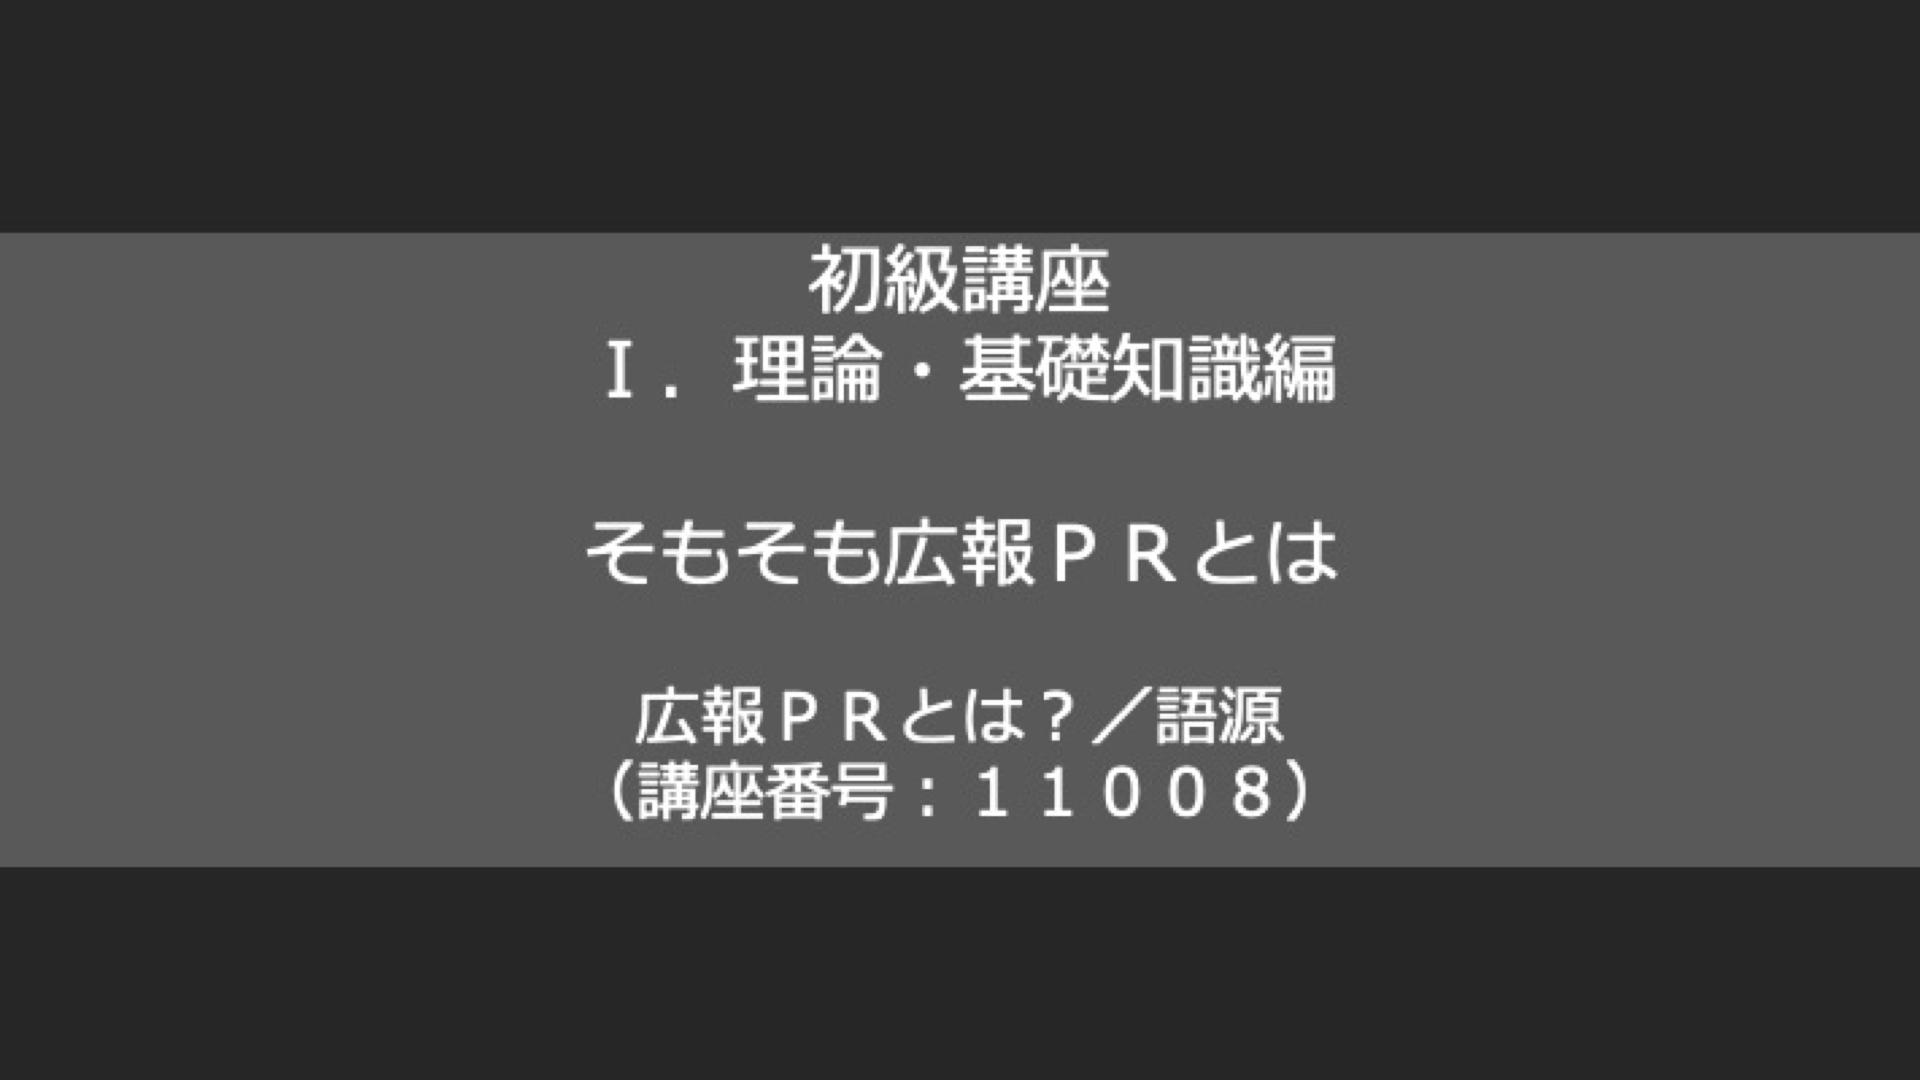 初級講座 Ⅰ.理論・基礎知識 「広報PRとは?/語源」